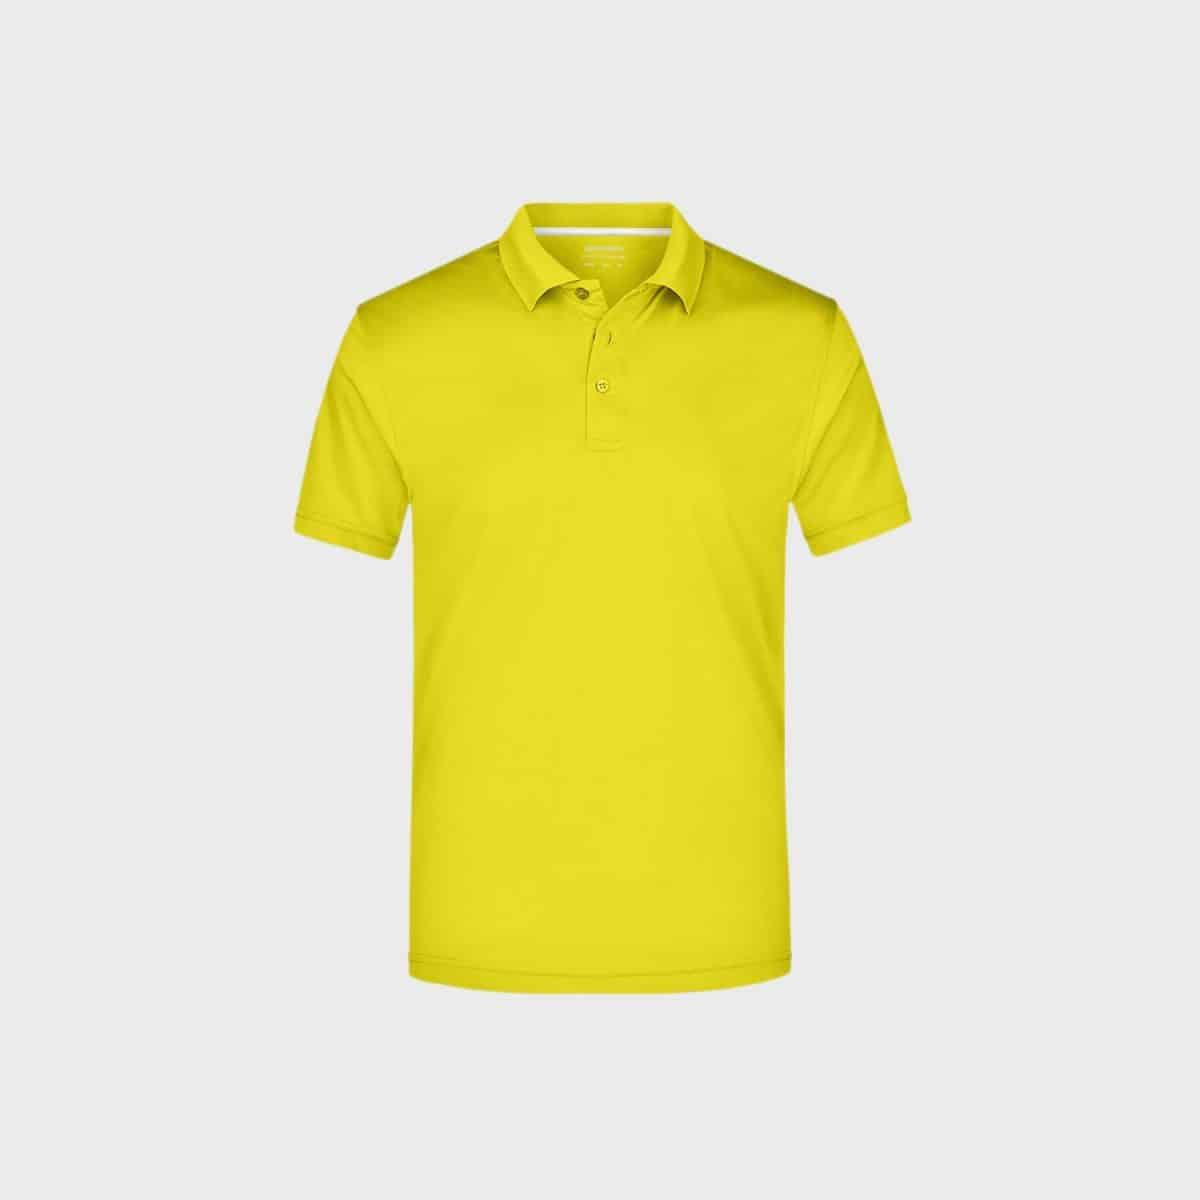 Daiber SportShirts JN401 Yellow Front